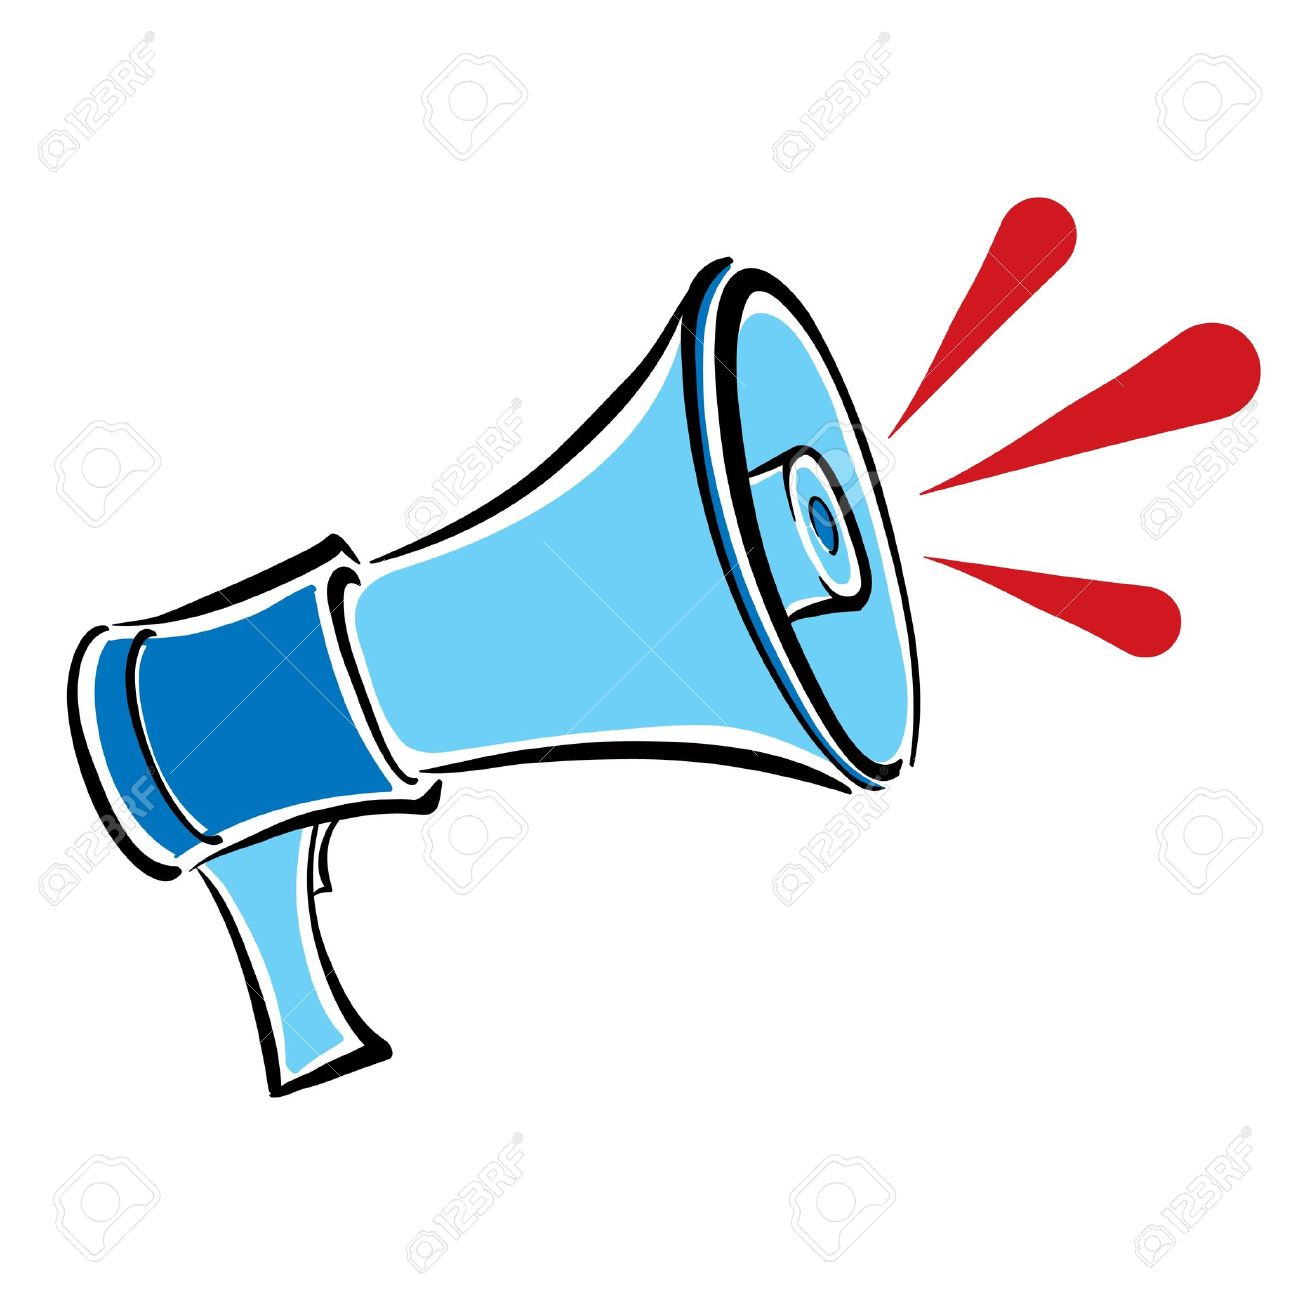 People clipart loudspeaker Haler Loud Clipart Clipart Haler